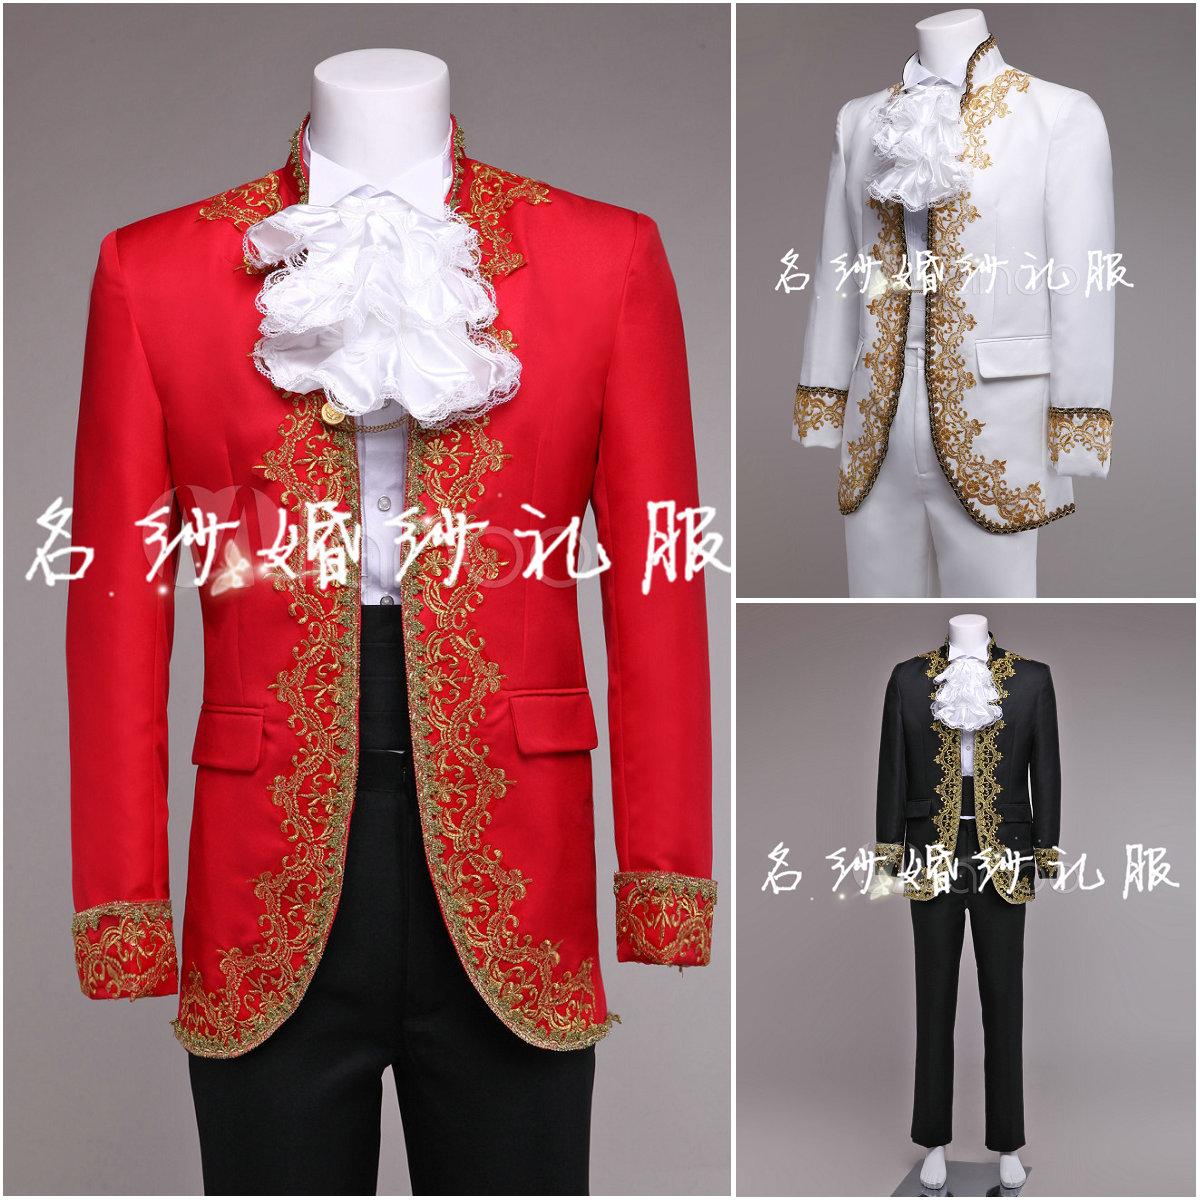 Деловой костюм X naihuafei 008 17